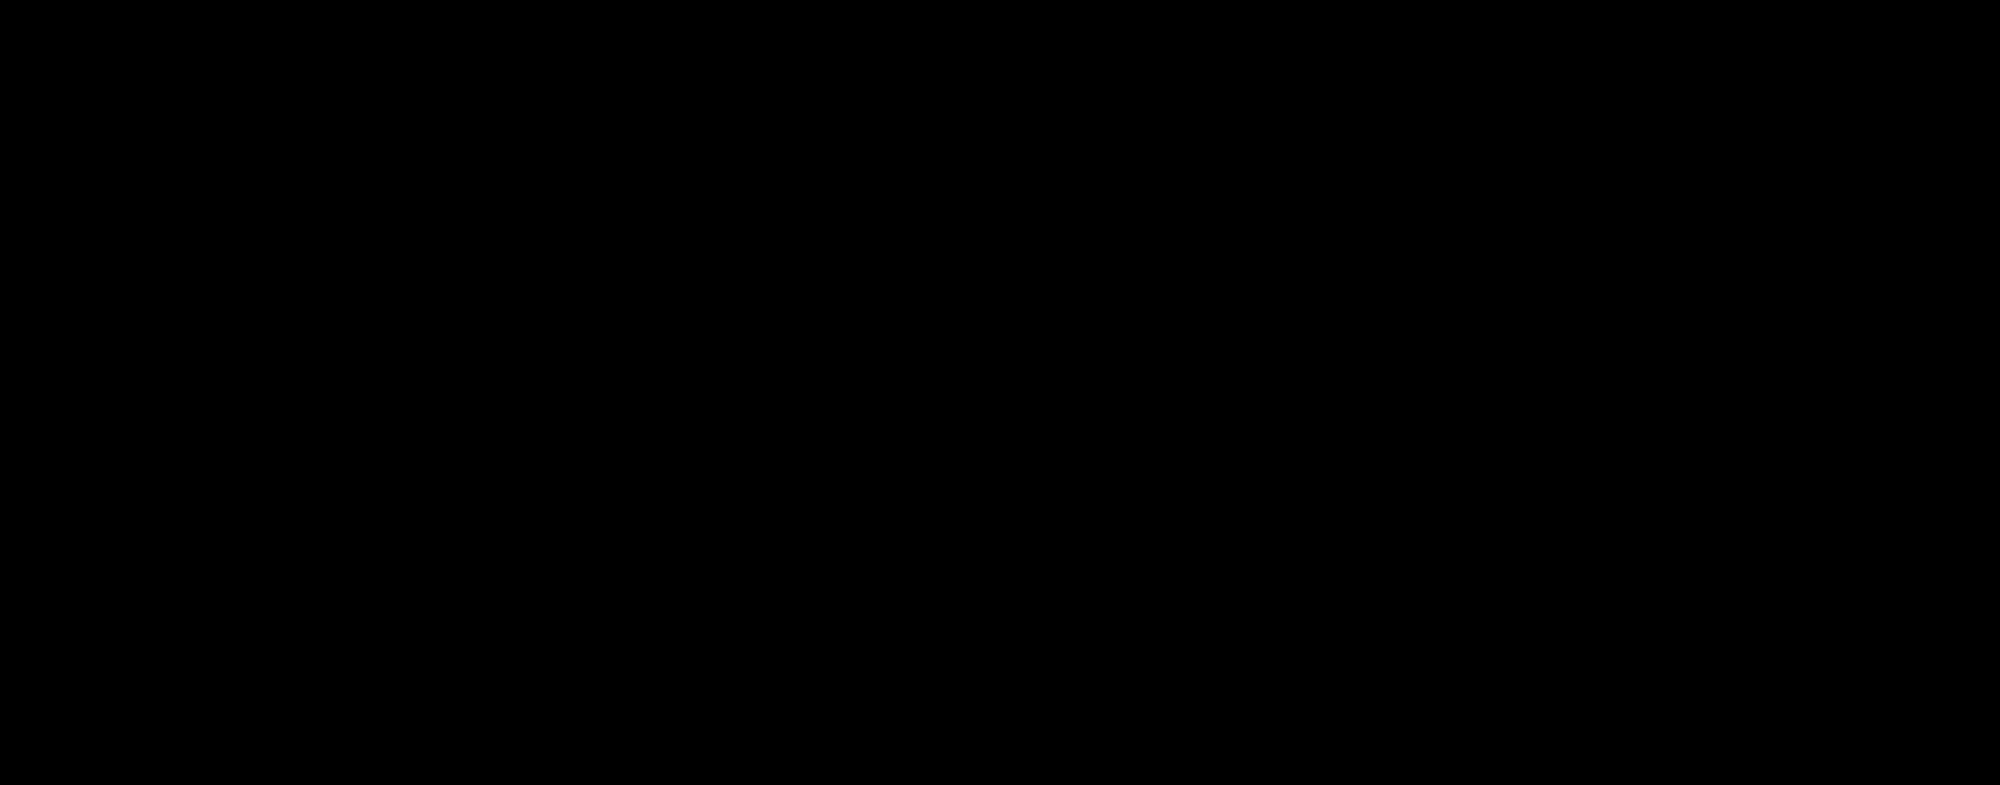 Dawna_s Birth Services-logo-black.png